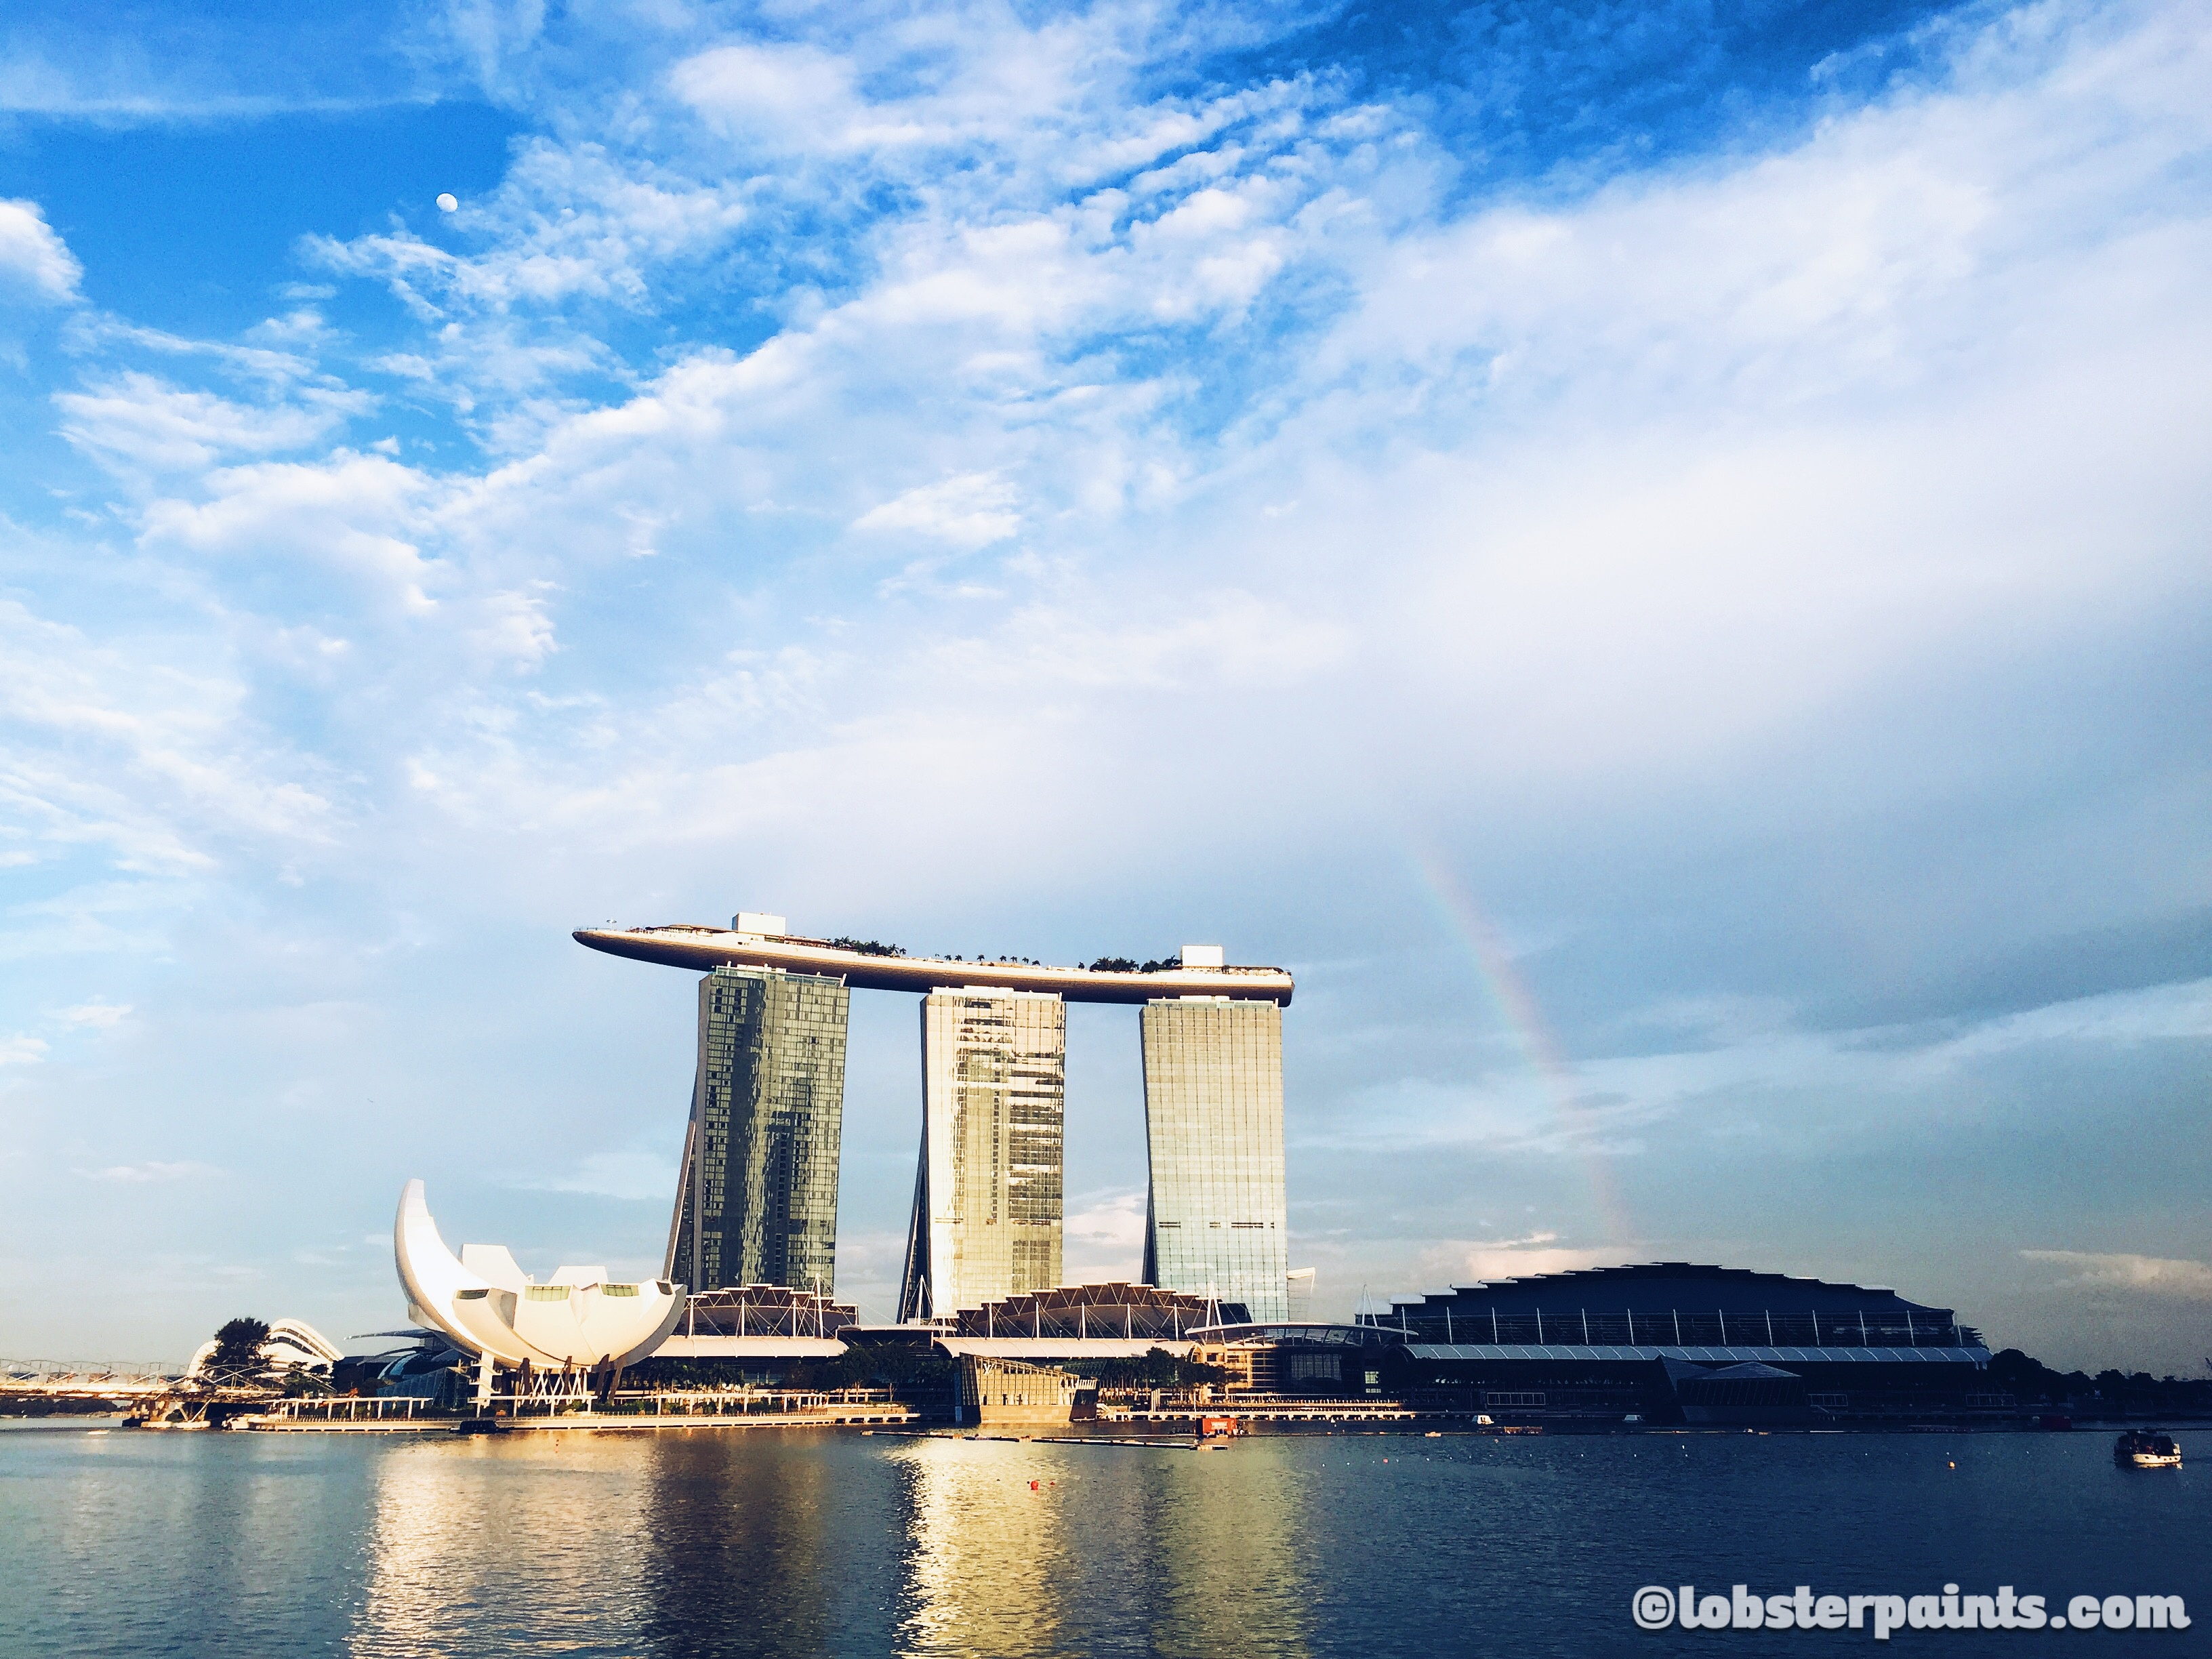 28 July 2015 | Marina Bay Sands, Singapore